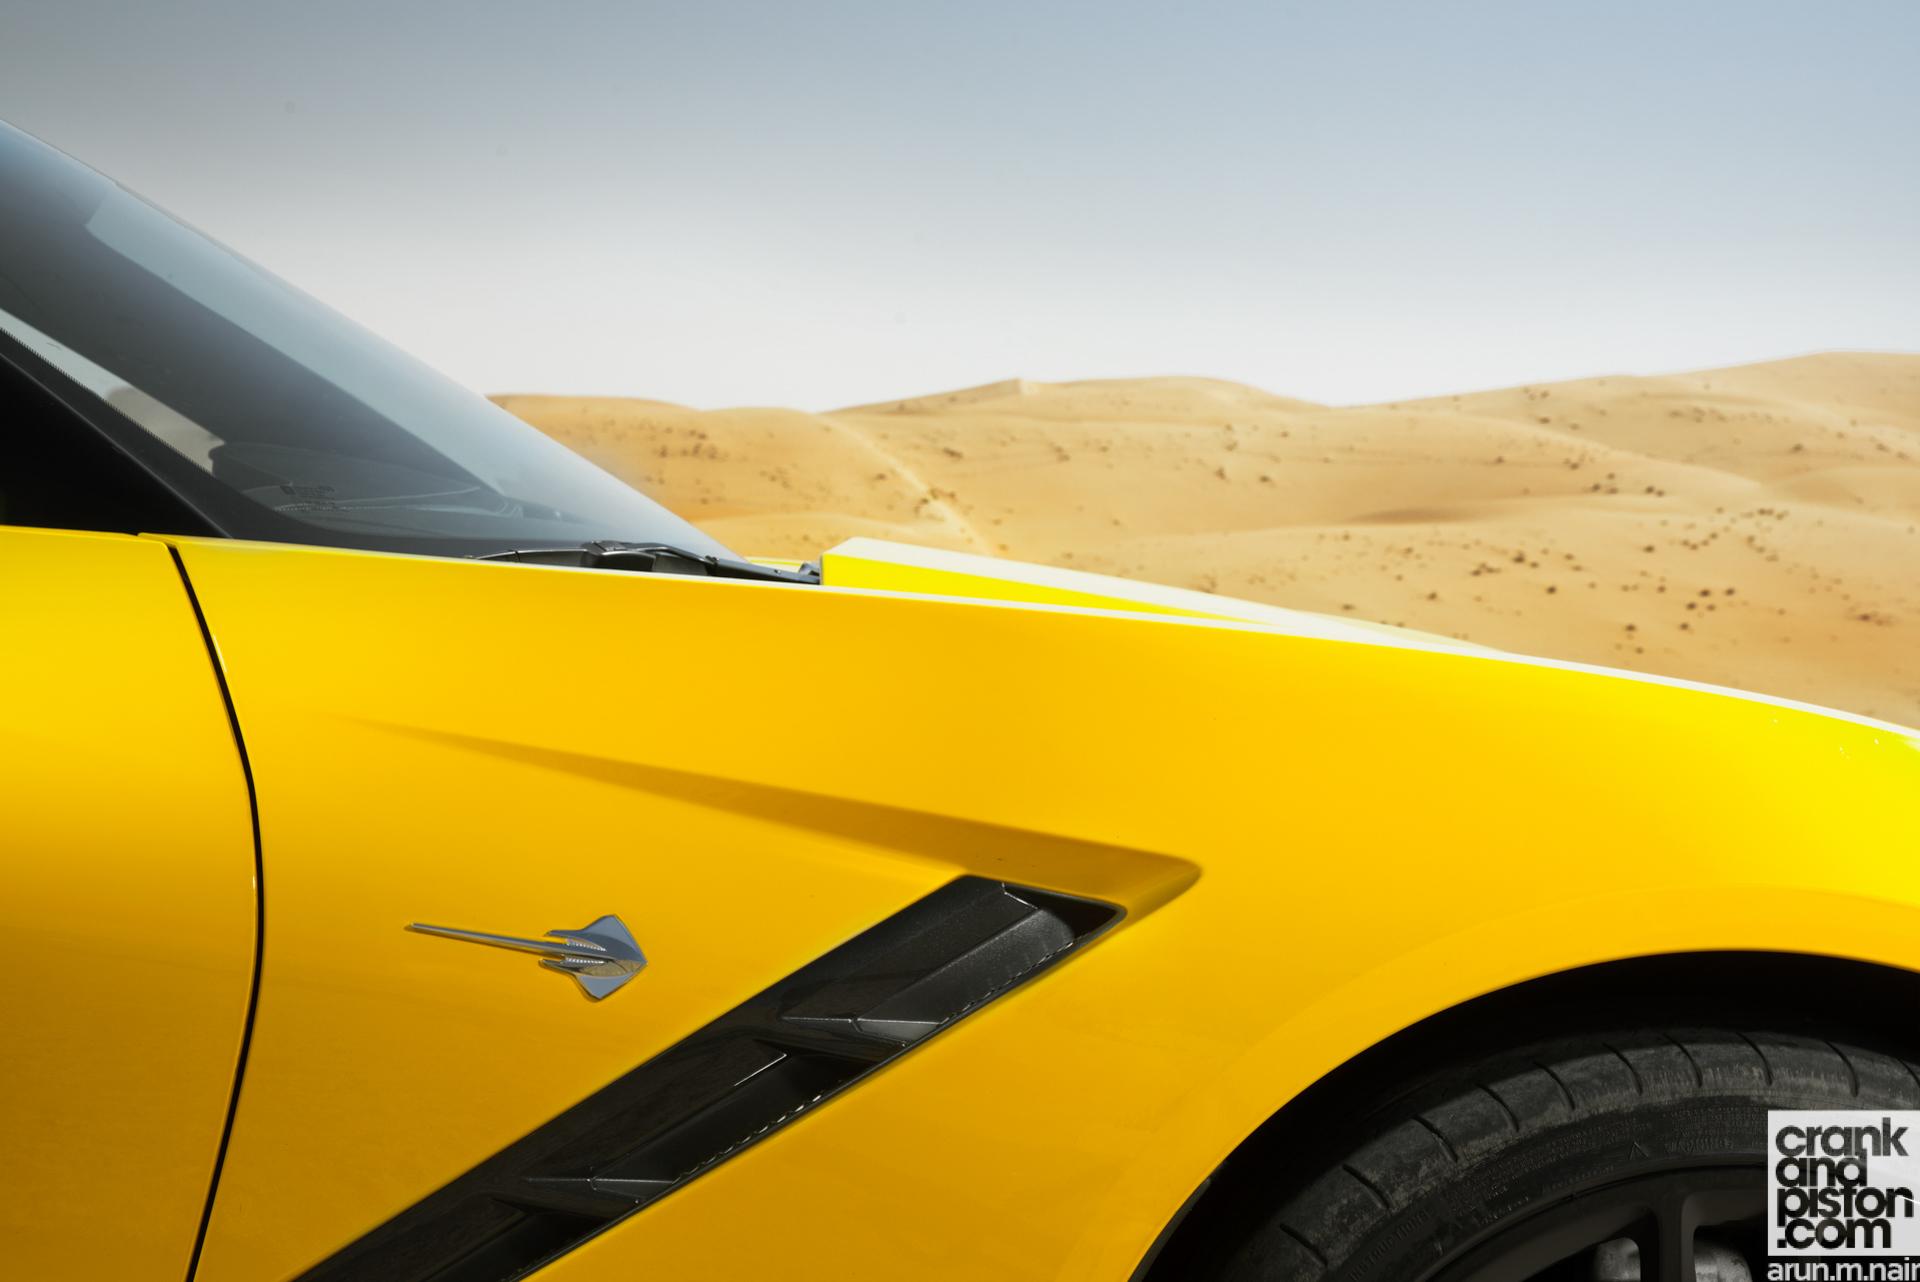 Corvette C7 Stingray convertible crankandpiston wallpapers-01